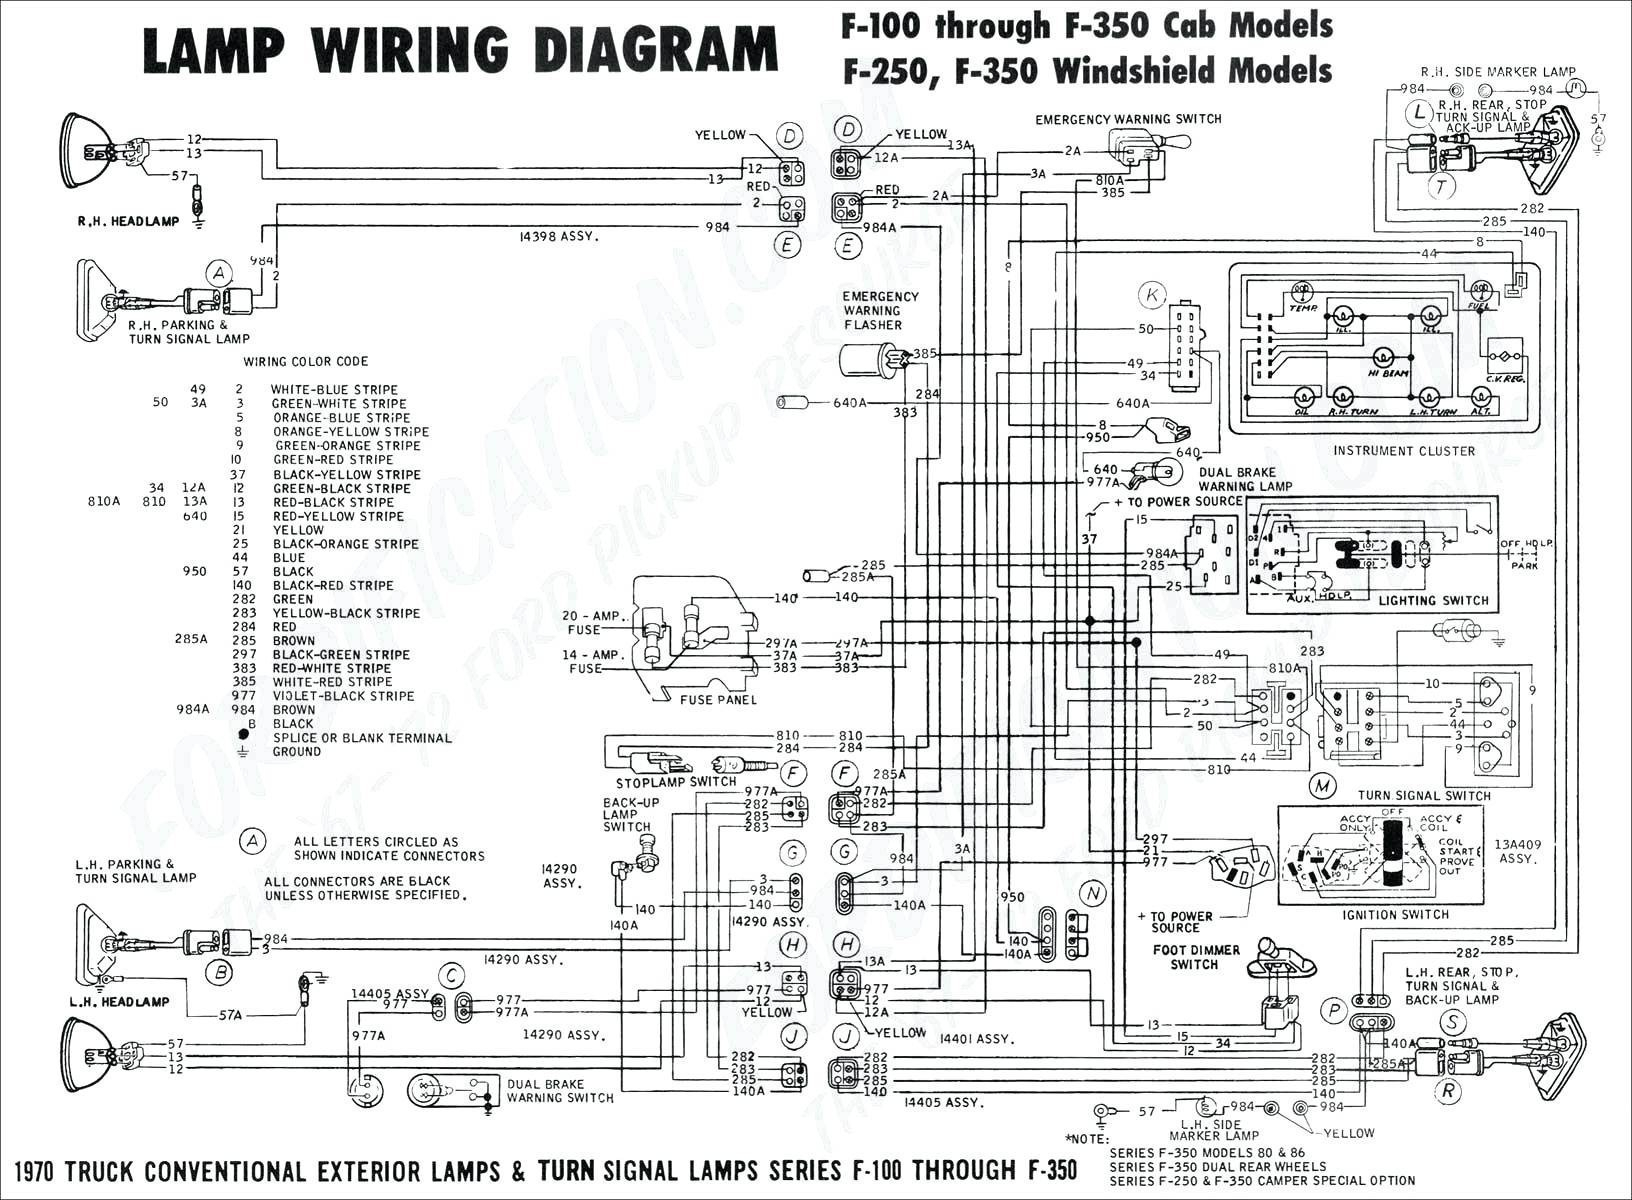 wiring diagram 20 amp plug